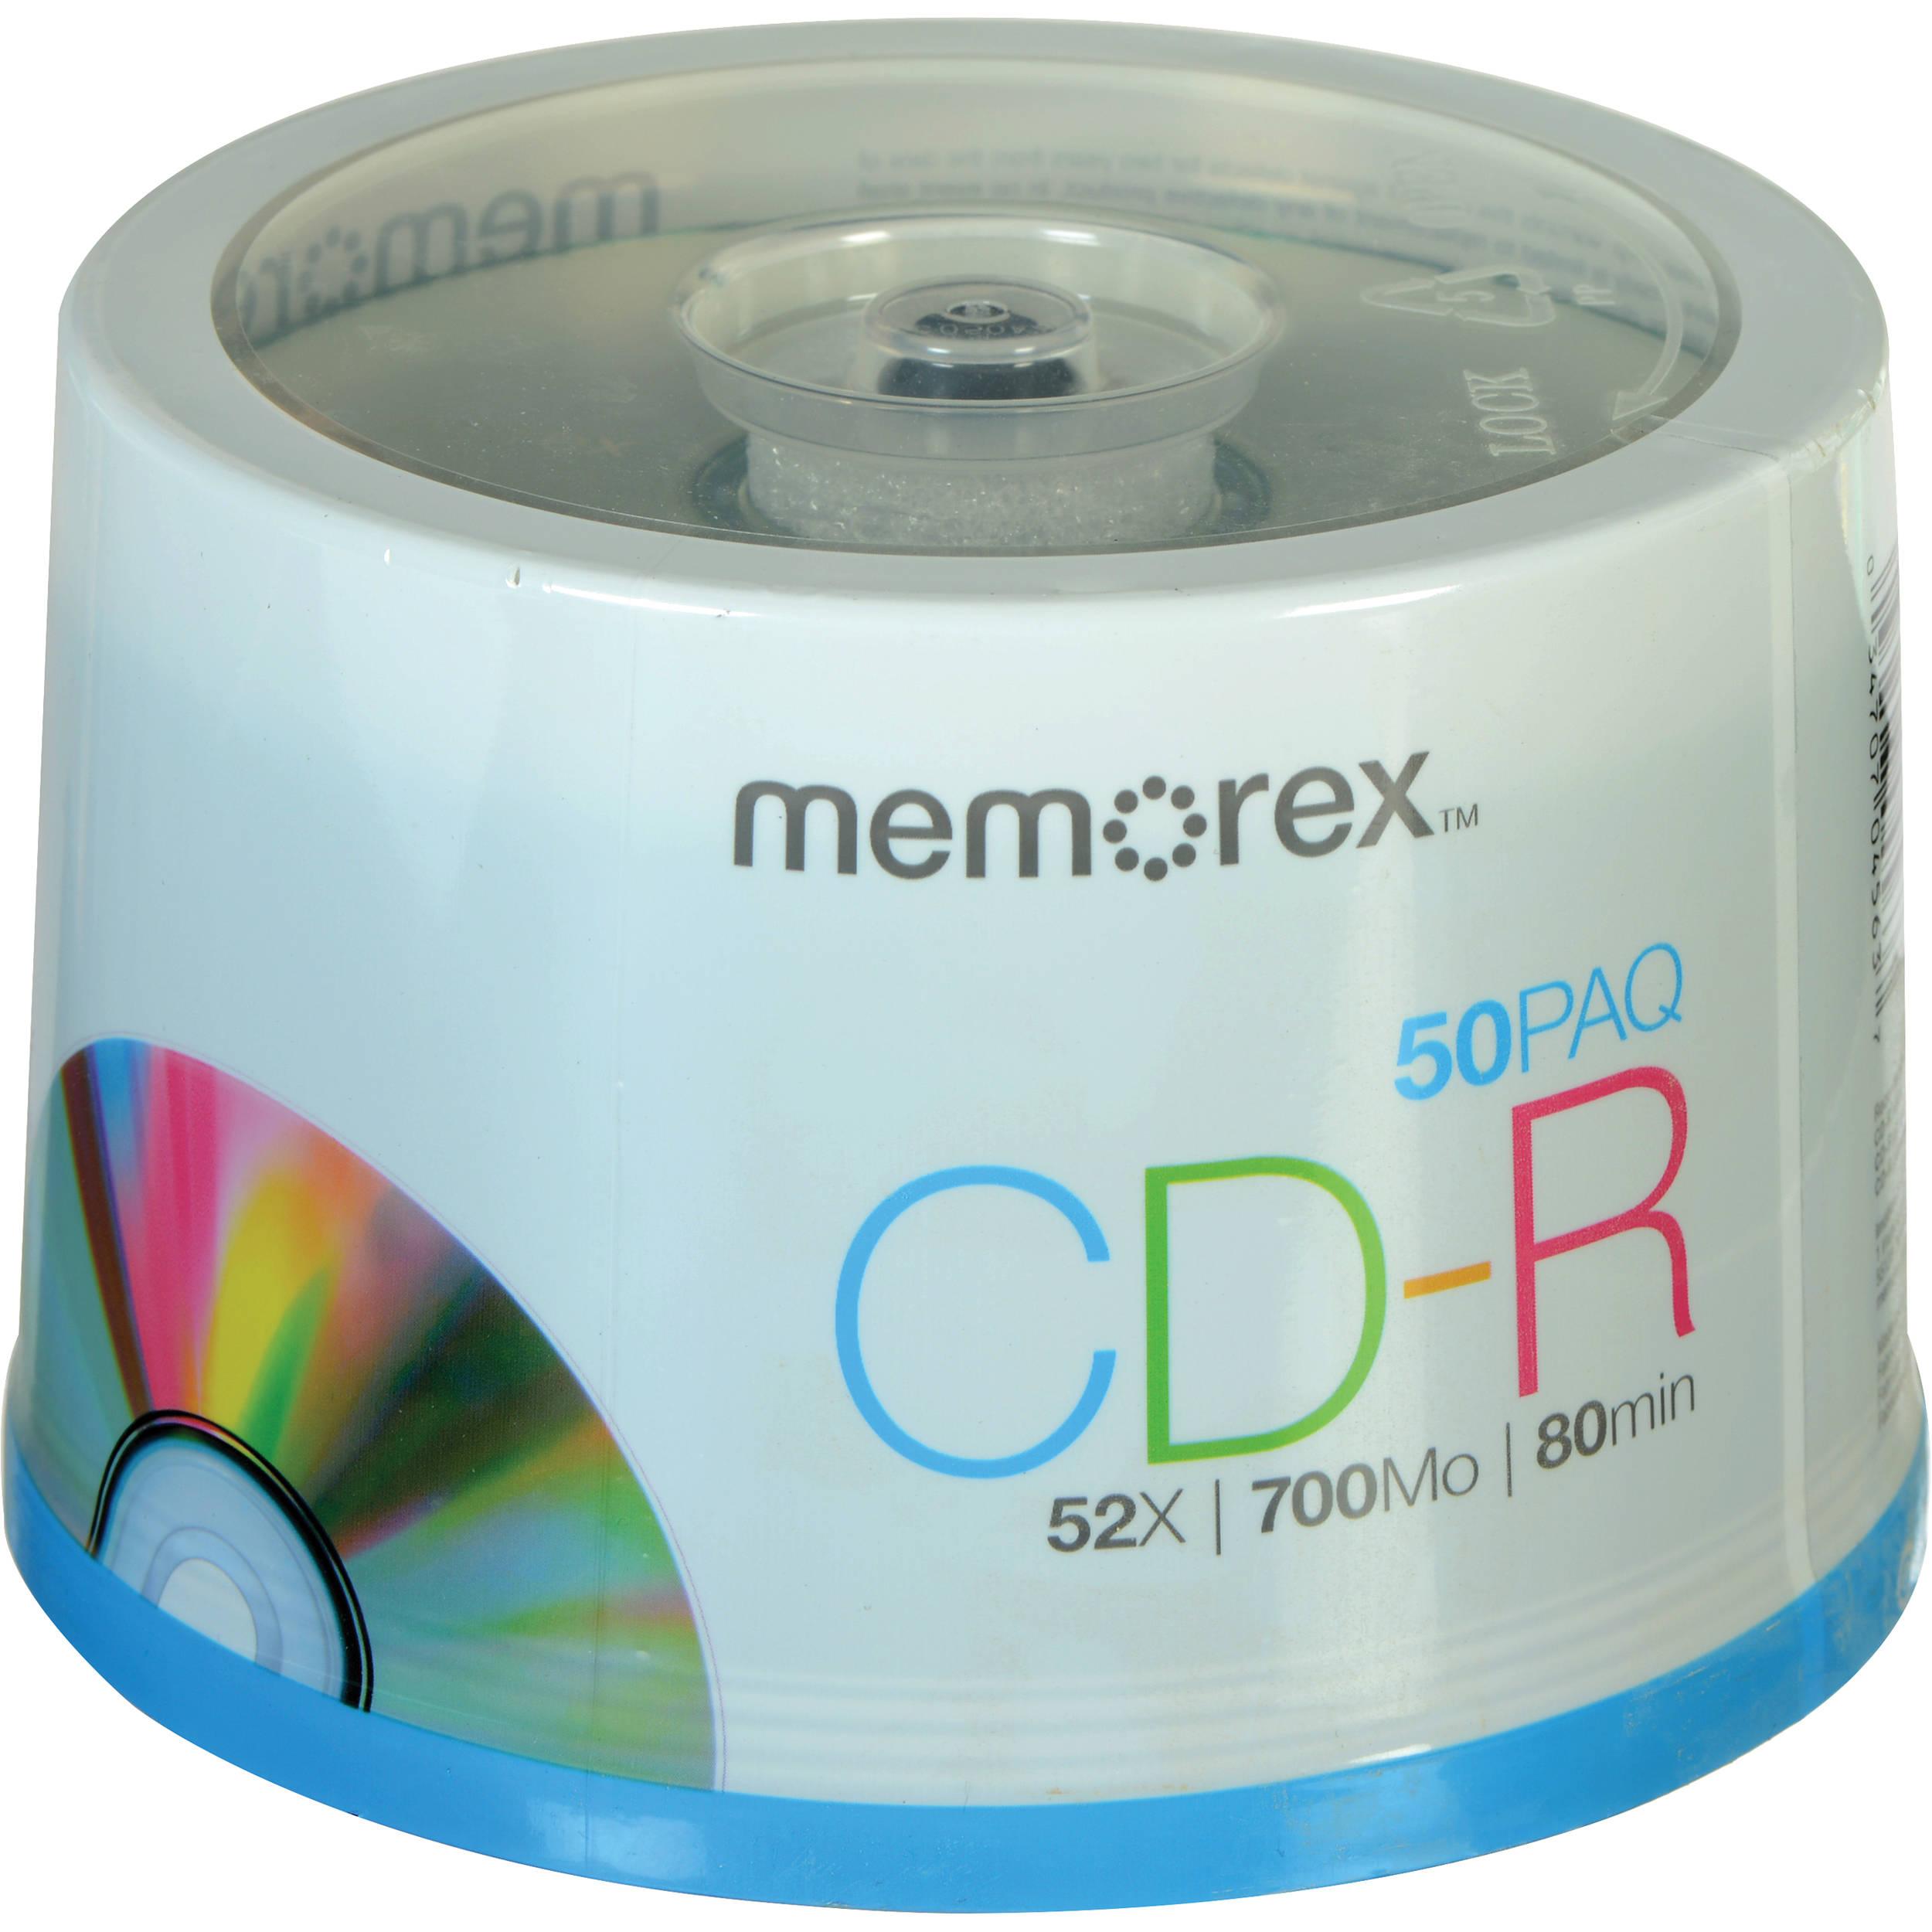 memorex cd r 700mb 52x write once recordable discs 04563 b h. Black Bedroom Furniture Sets. Home Design Ideas